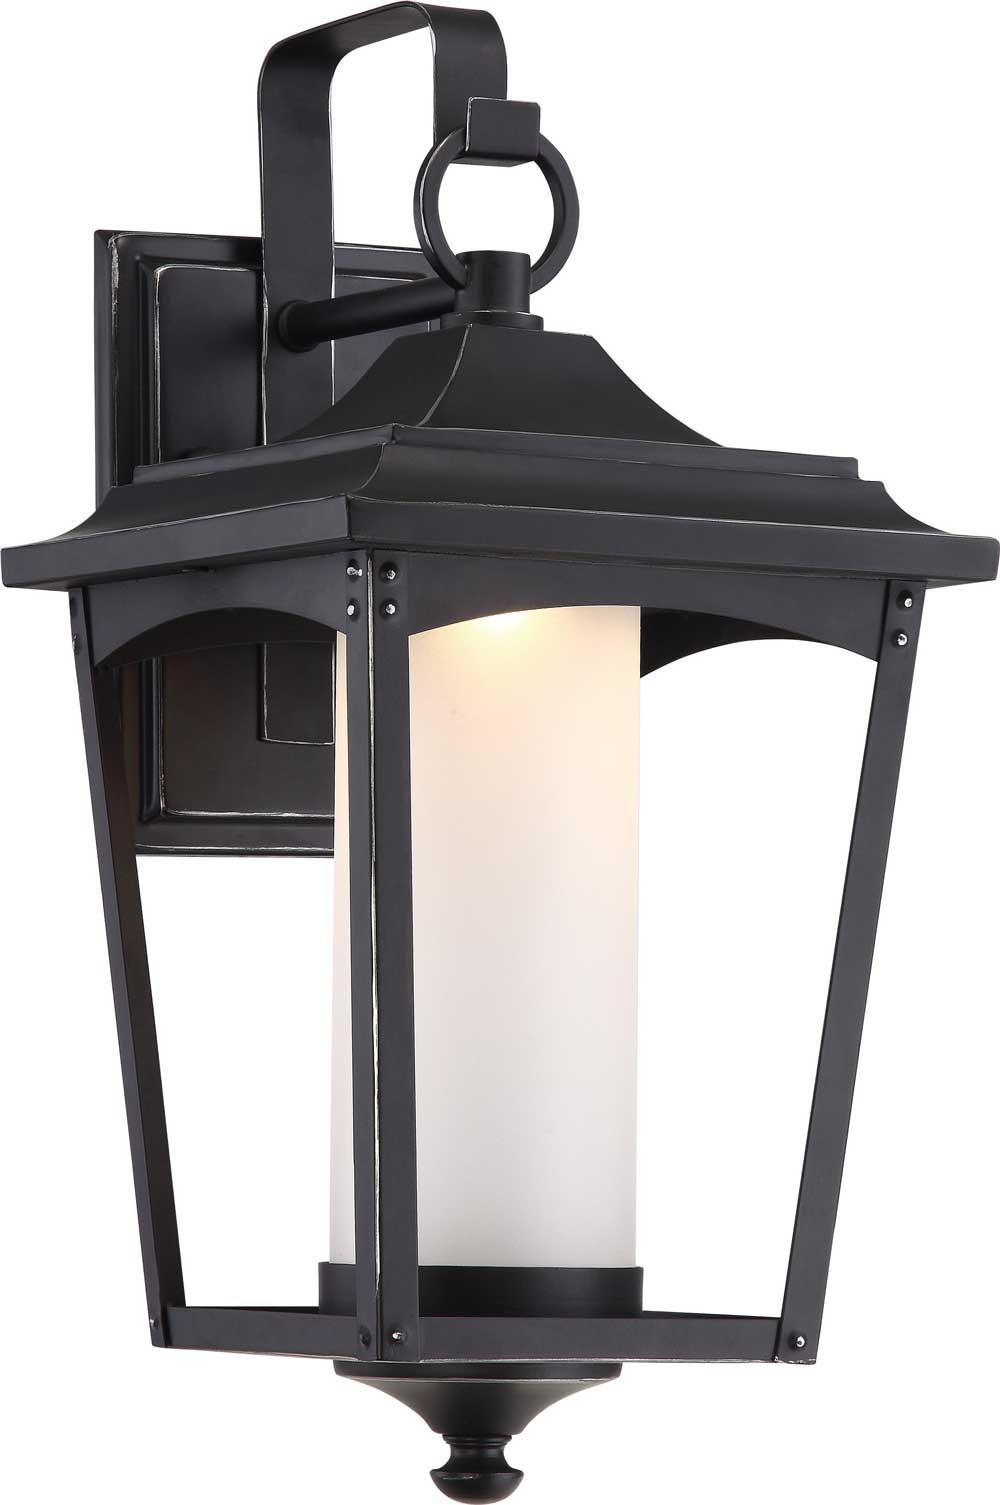 Nuvo Lighting Essex LED